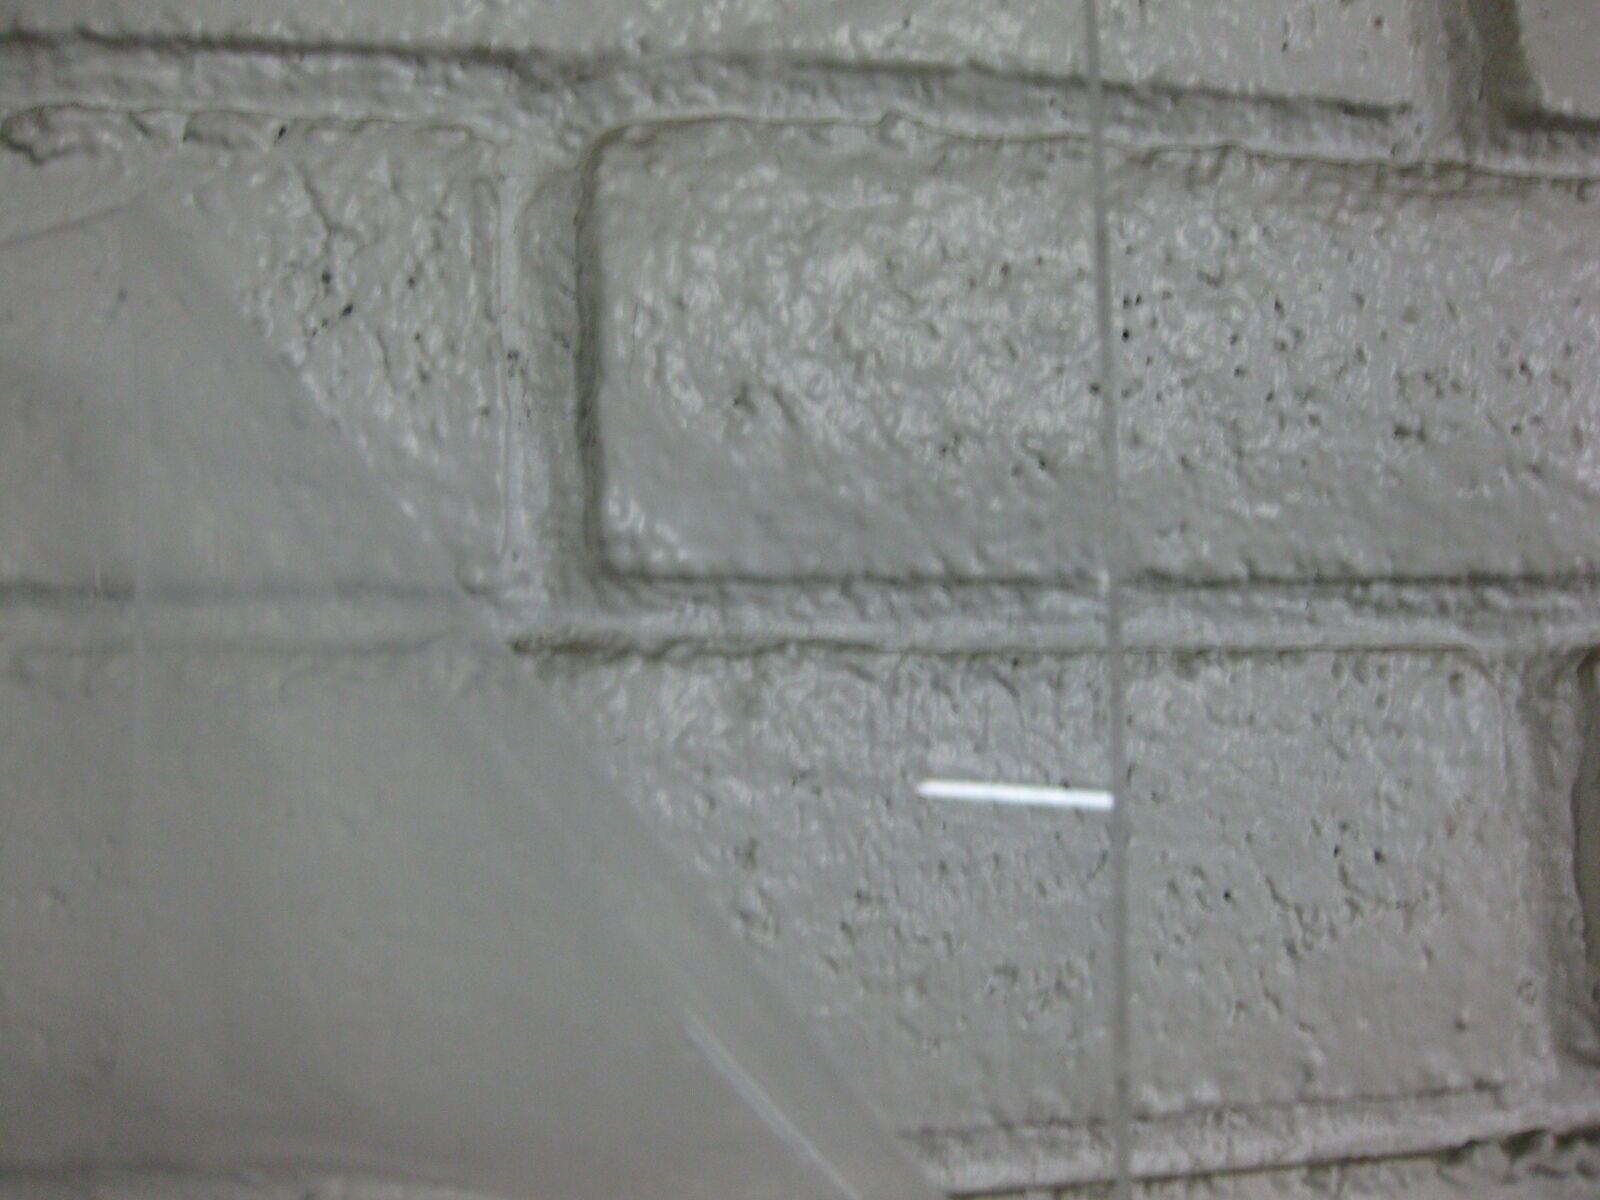 0 125 X 48 X 96 Clear Plexiglass Acrylic Sheet At Eplastics Clear Acrylic Sheet Clear Plexiglass Plexiglass Sheets